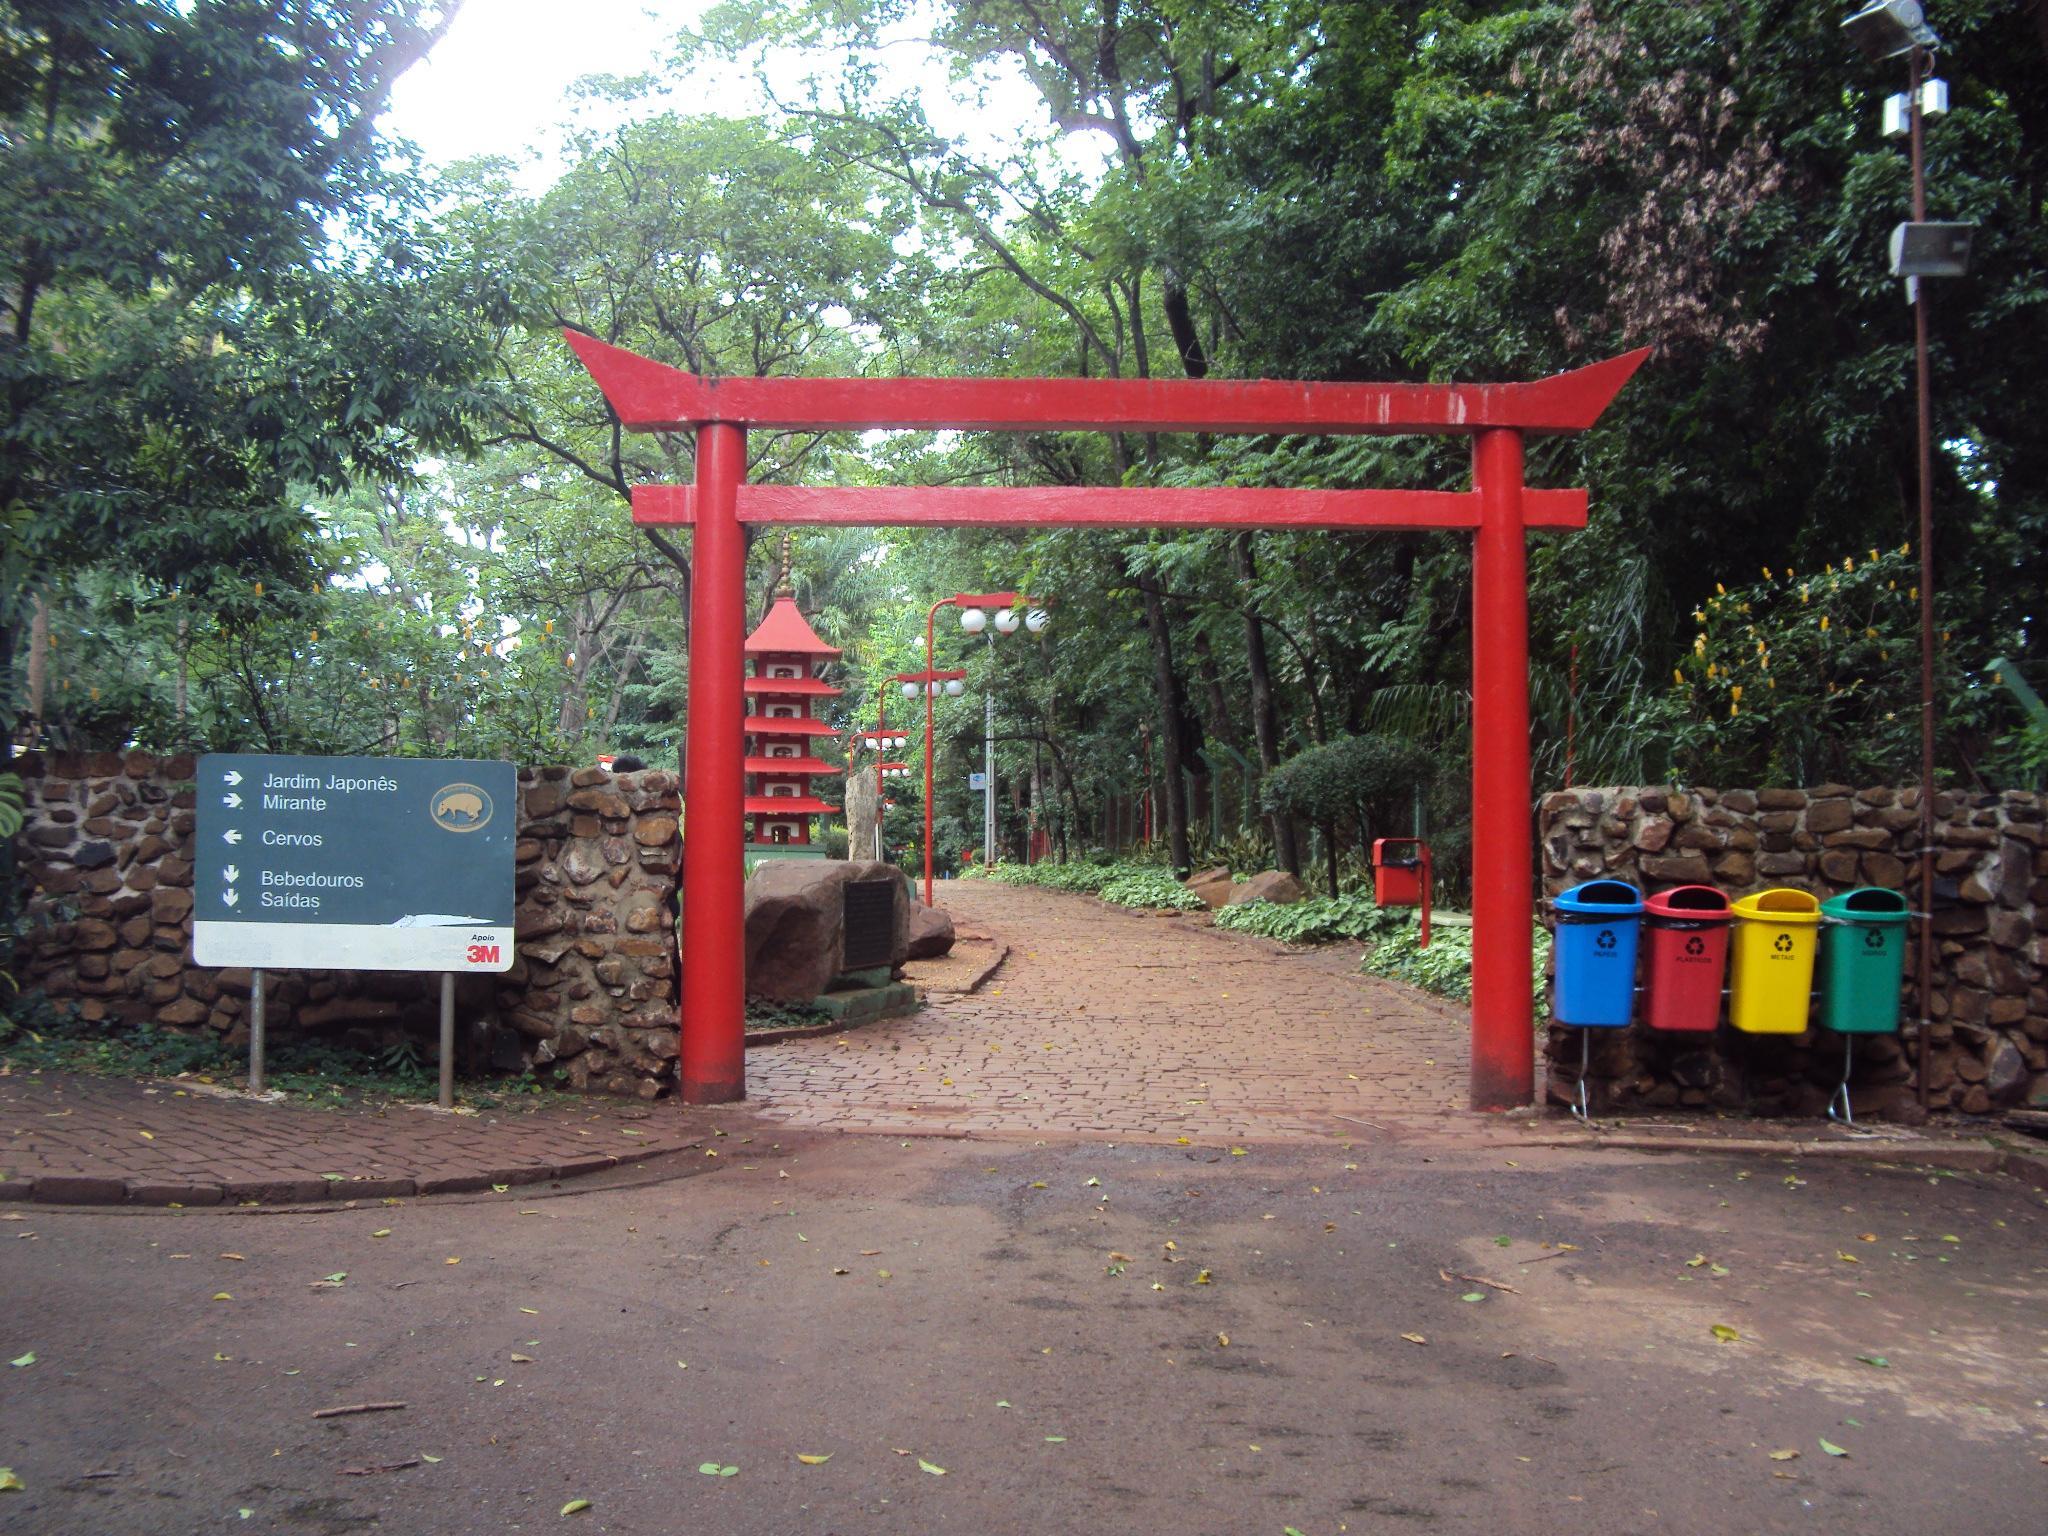 plantas do jardim japones